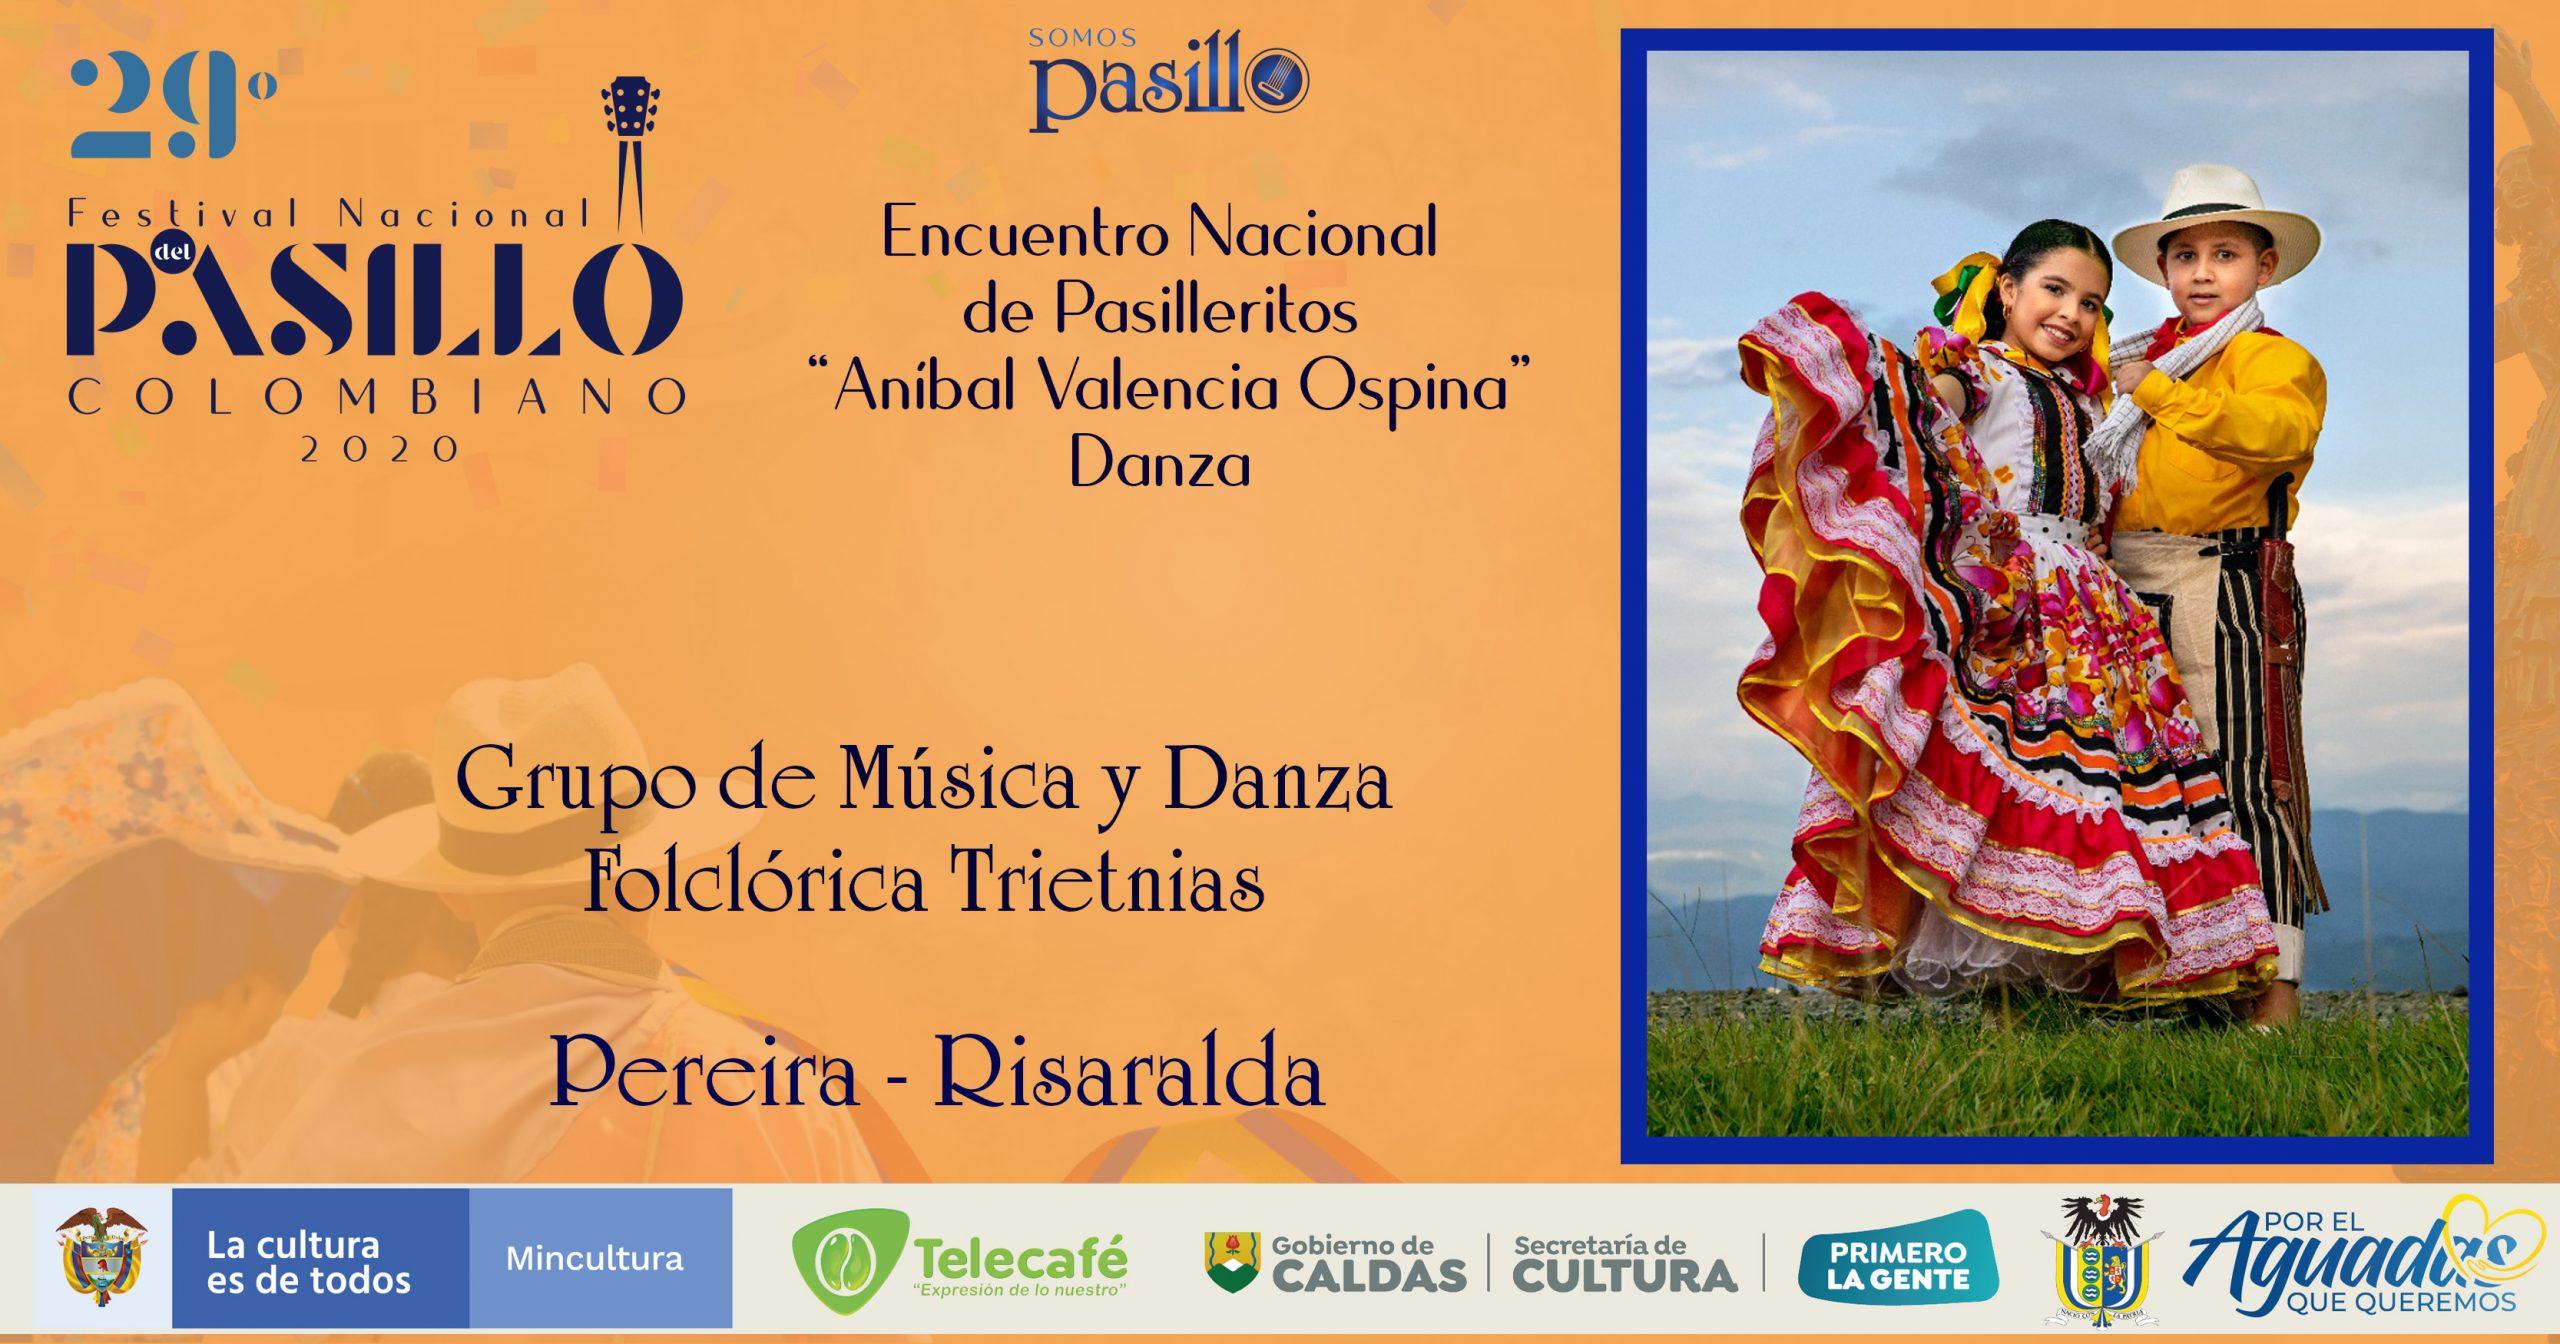 Grupo de Música y Danza Folclórica Trietnias